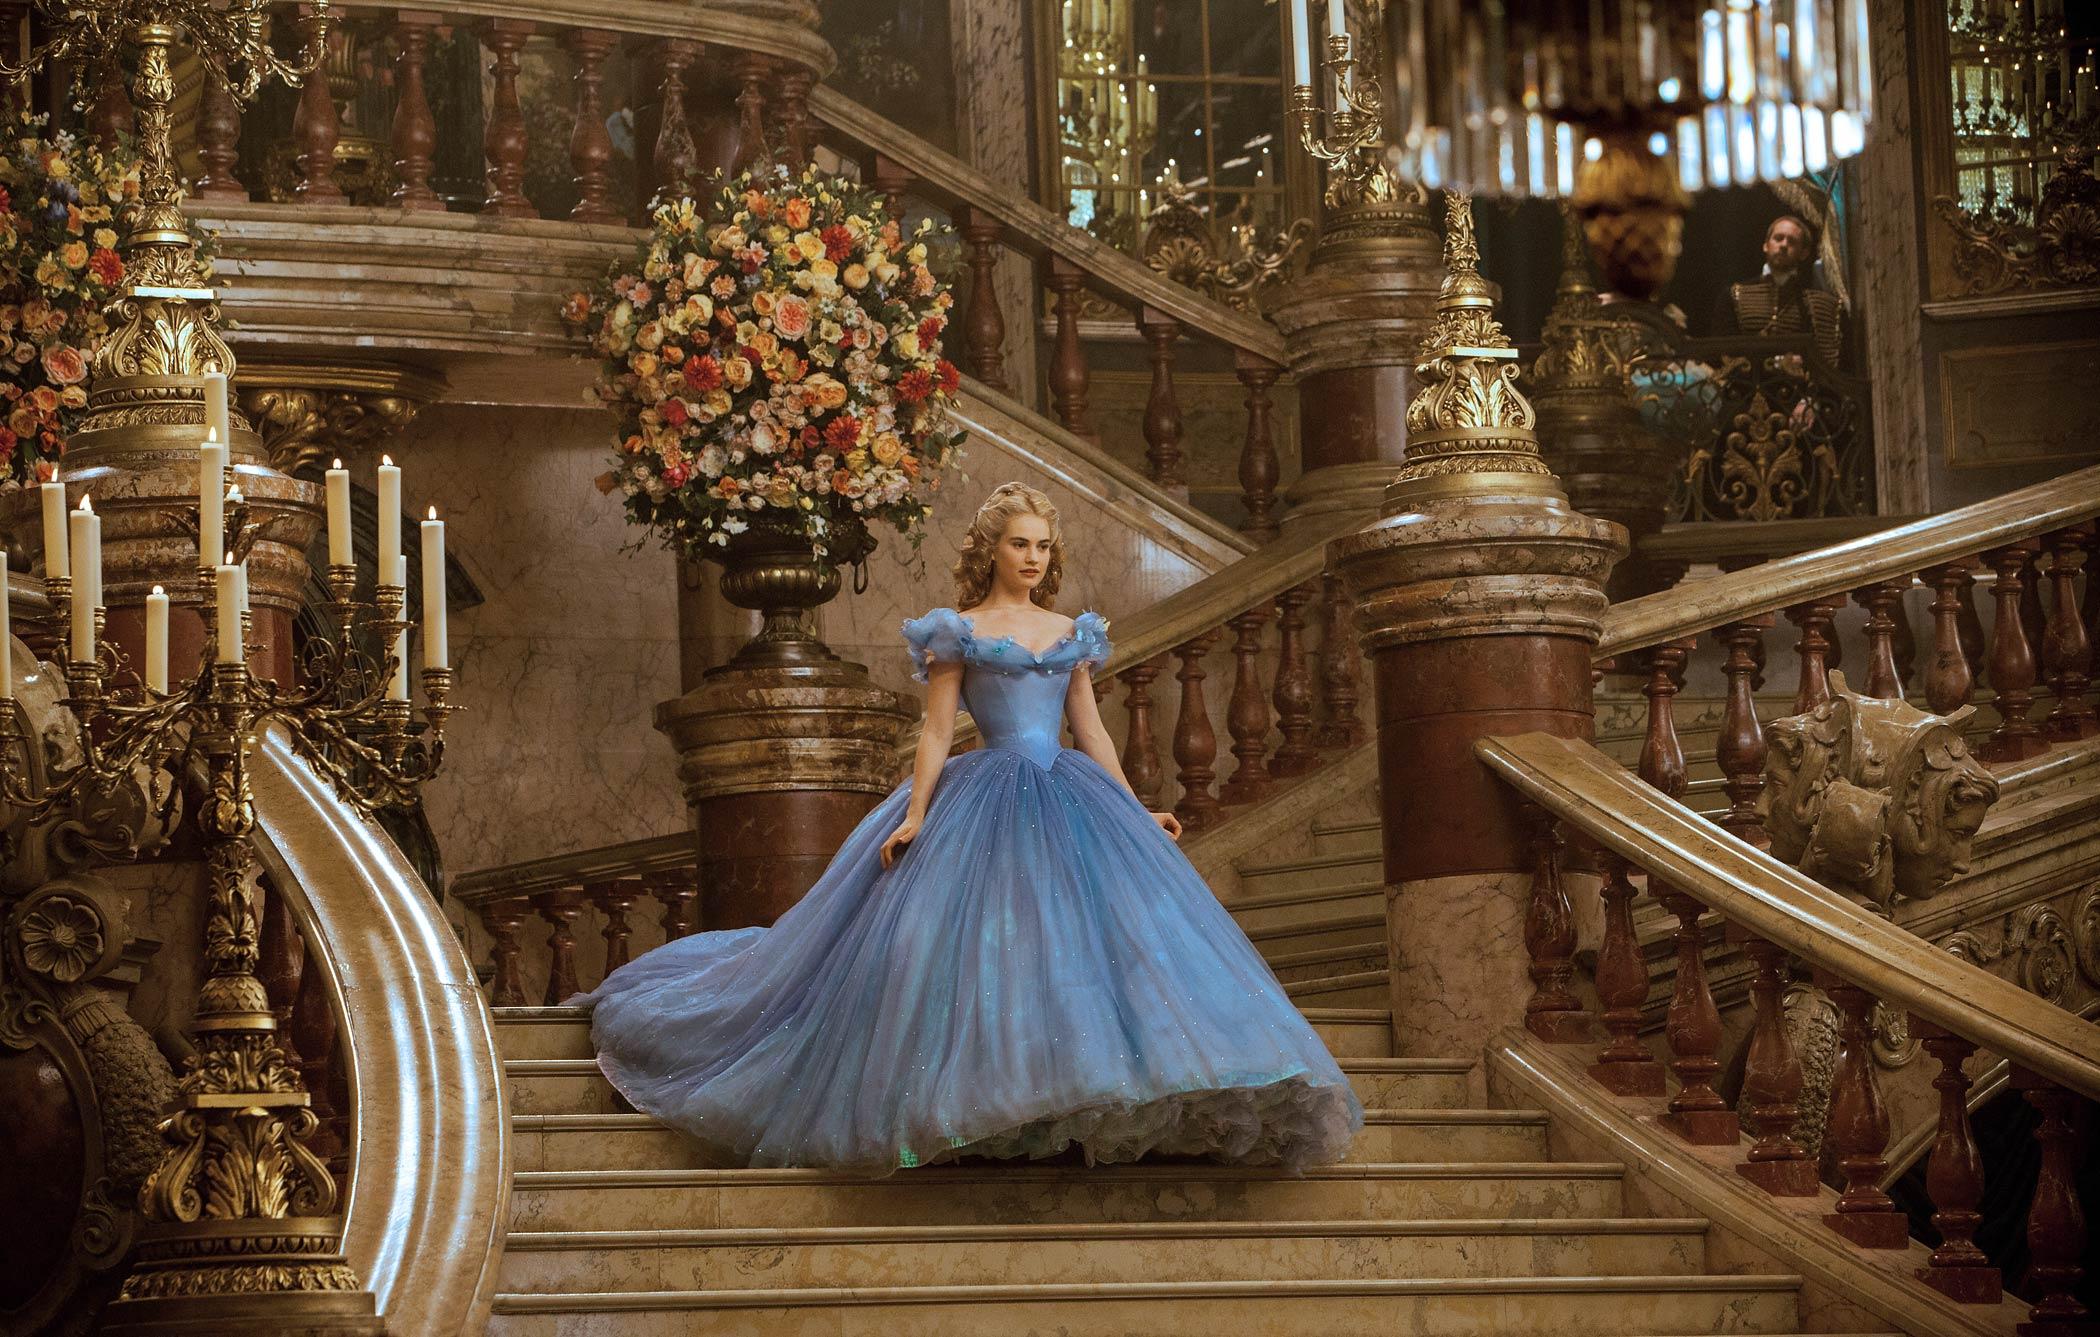 Lily James stars as Cinderella in Disney's live-action movie Cinderella